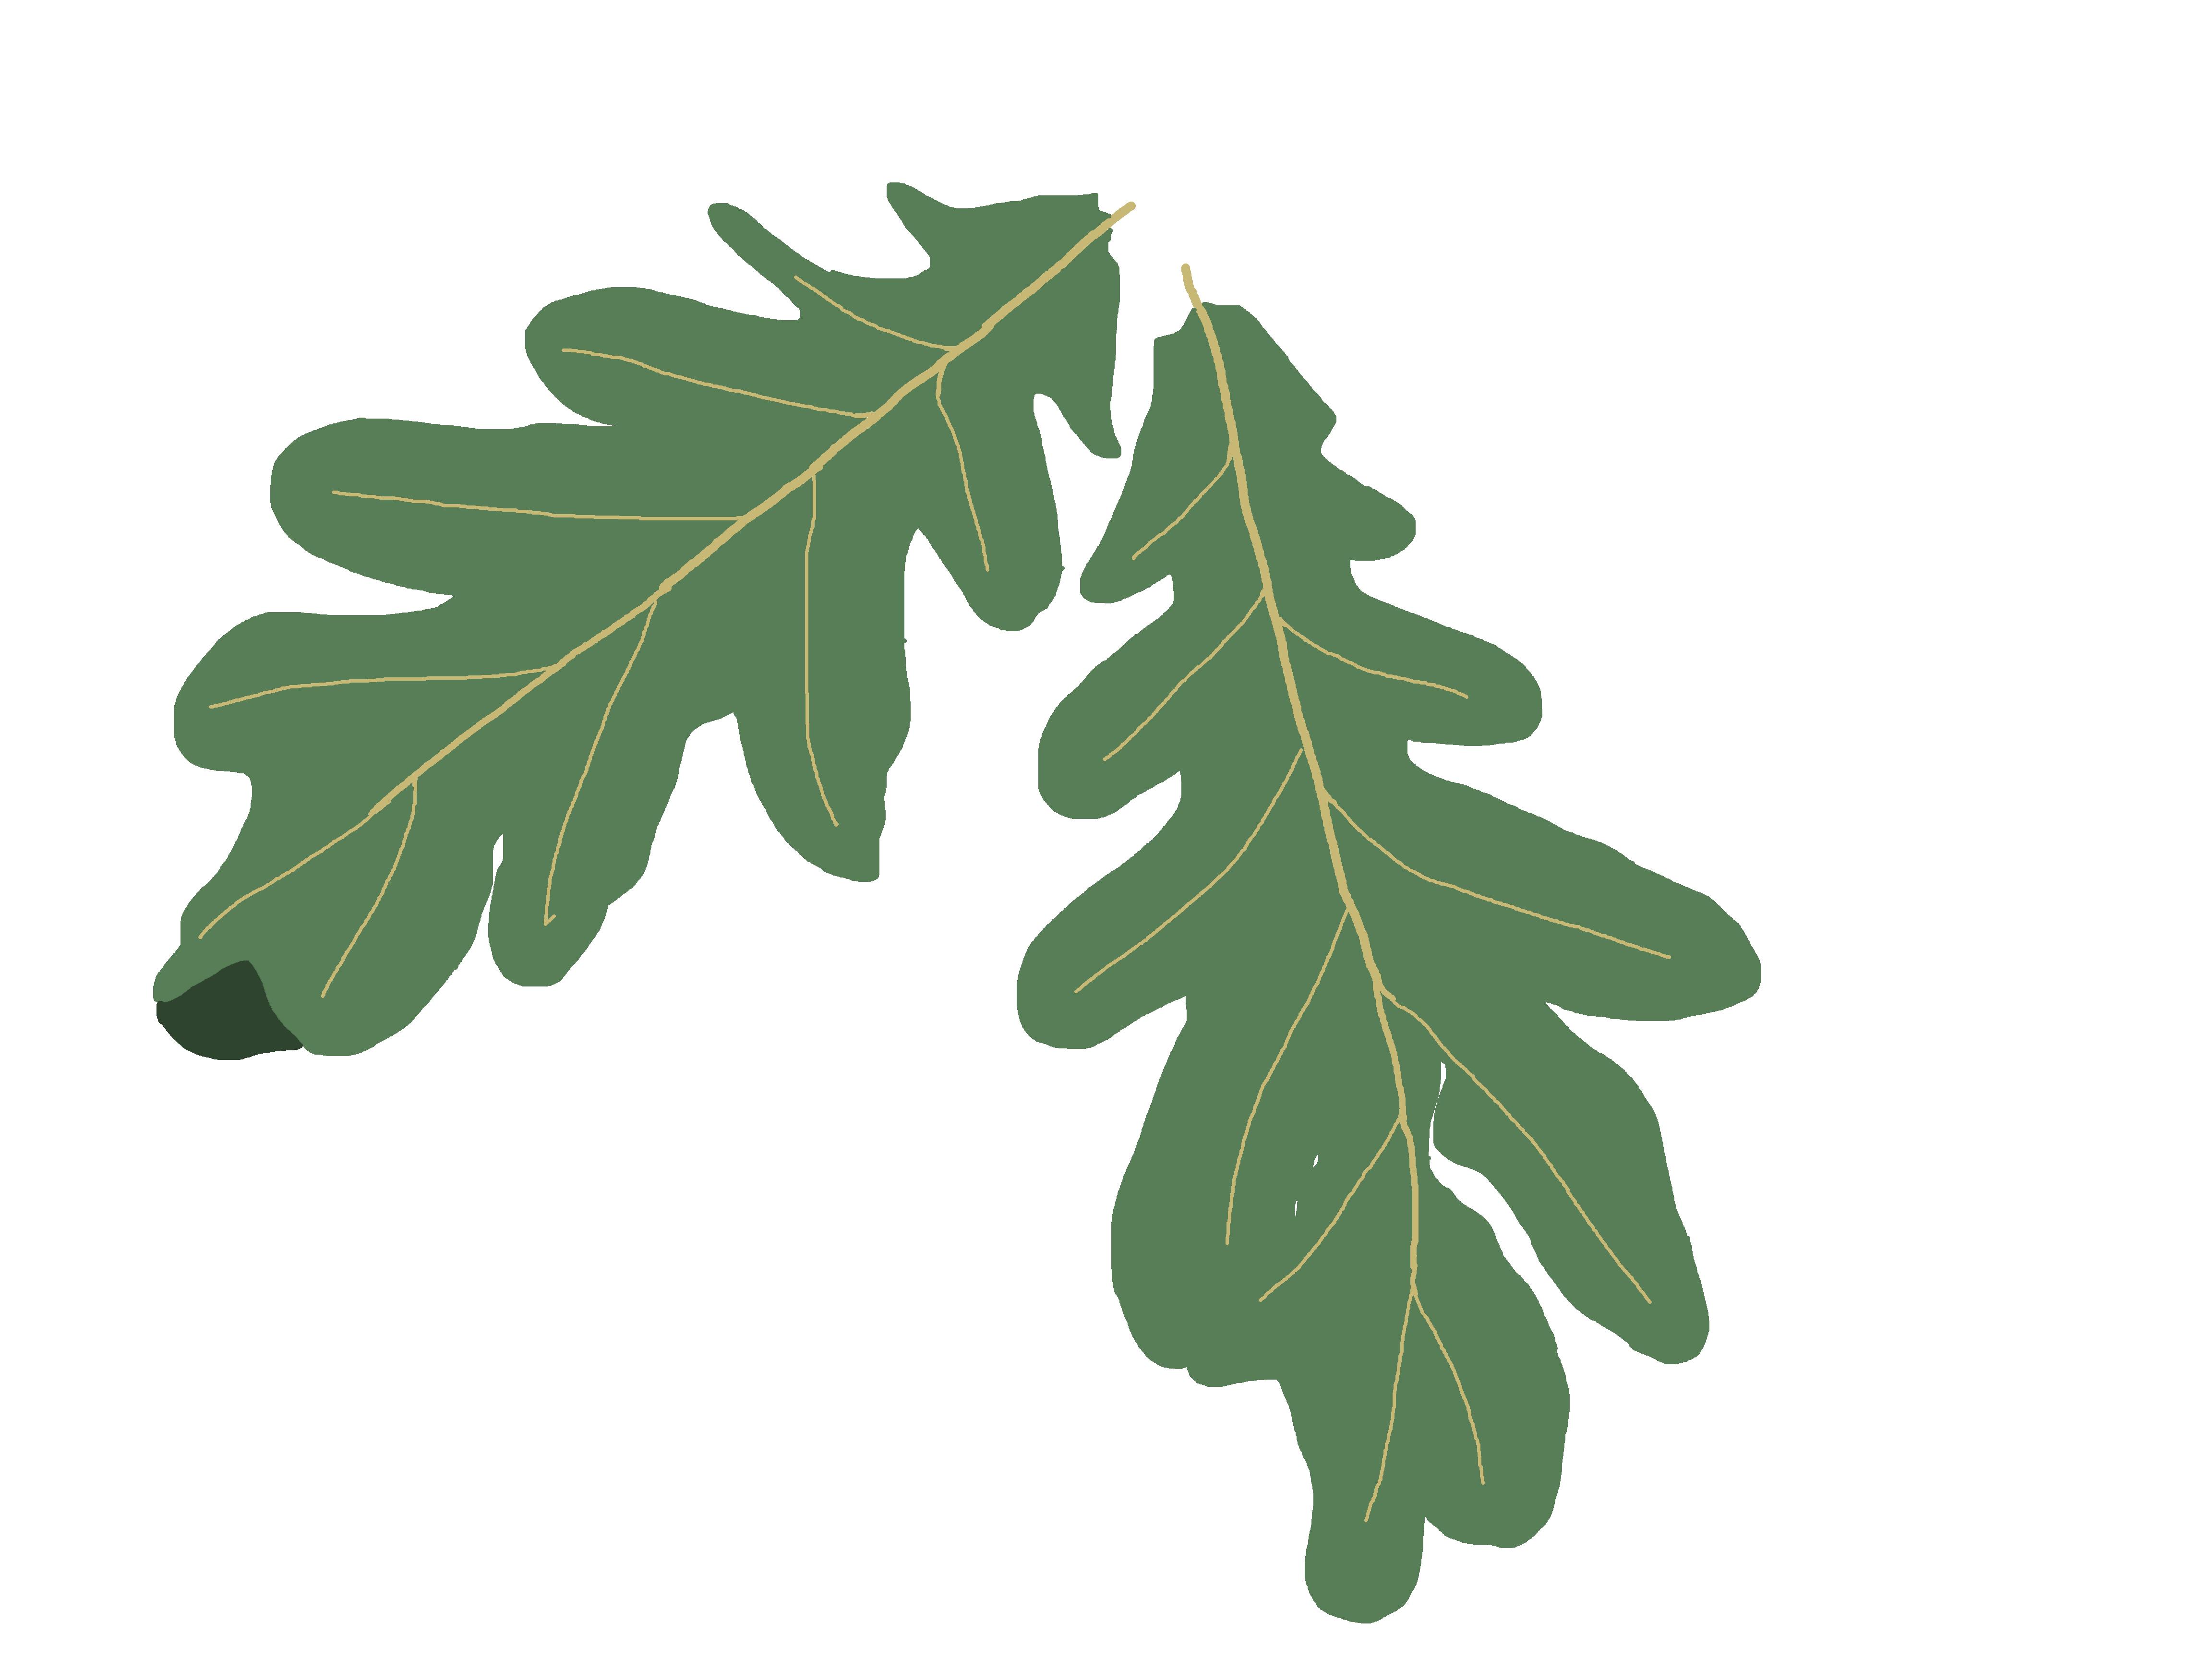 4608x3456 free png oak tree free oak tree transparent images